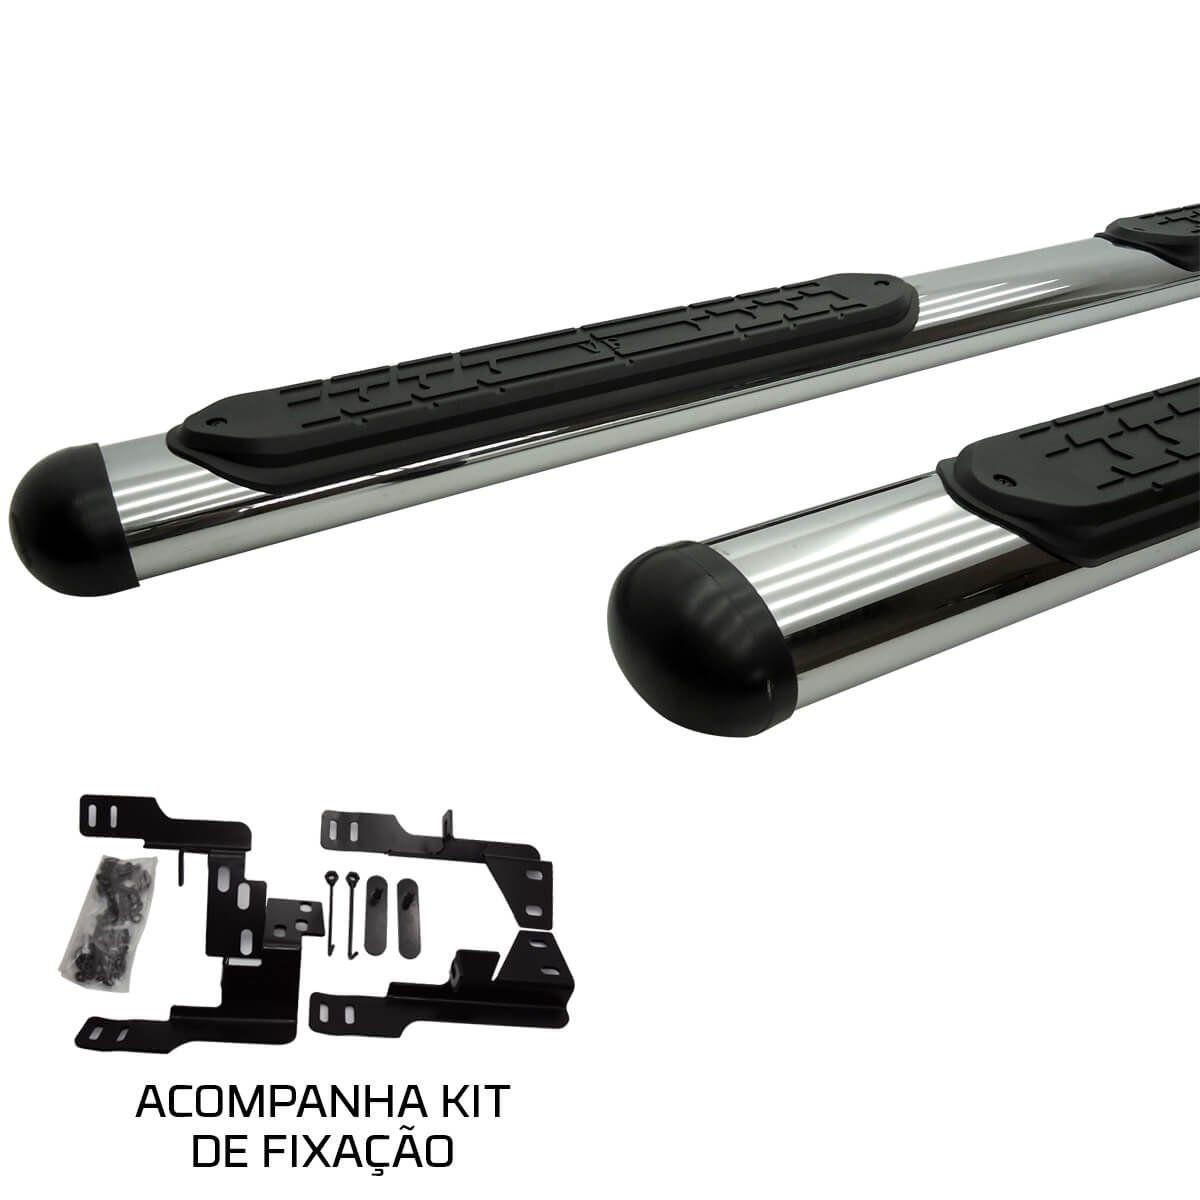 Estribo oval cromado Amarok cabine dupla 2011 a 2019